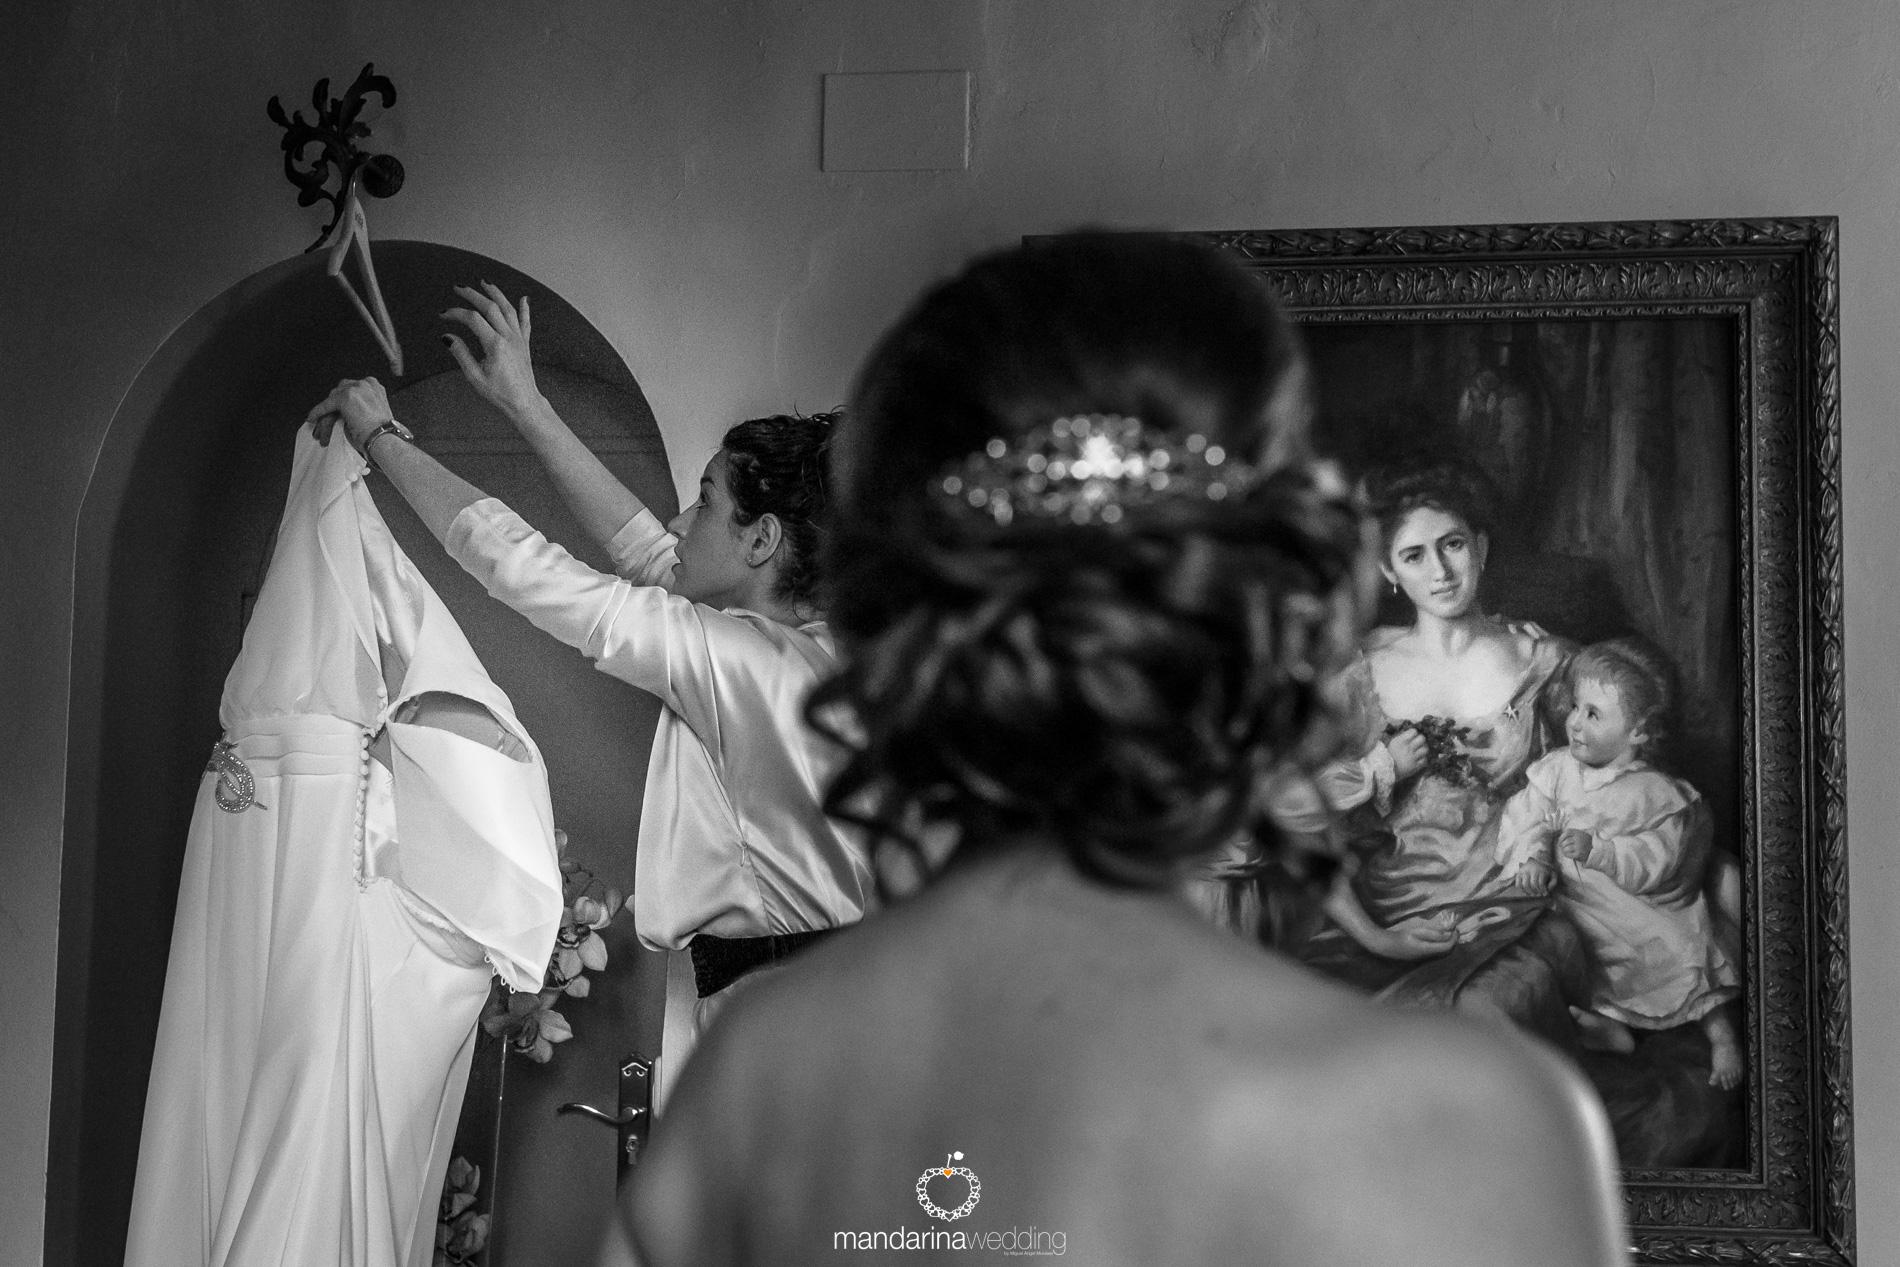 mandarina wedding, fotografos de boda, fotografo boda soria, fotografo boda barcelona, fotografo boda Madrid, fotógrafo boda lerida_23